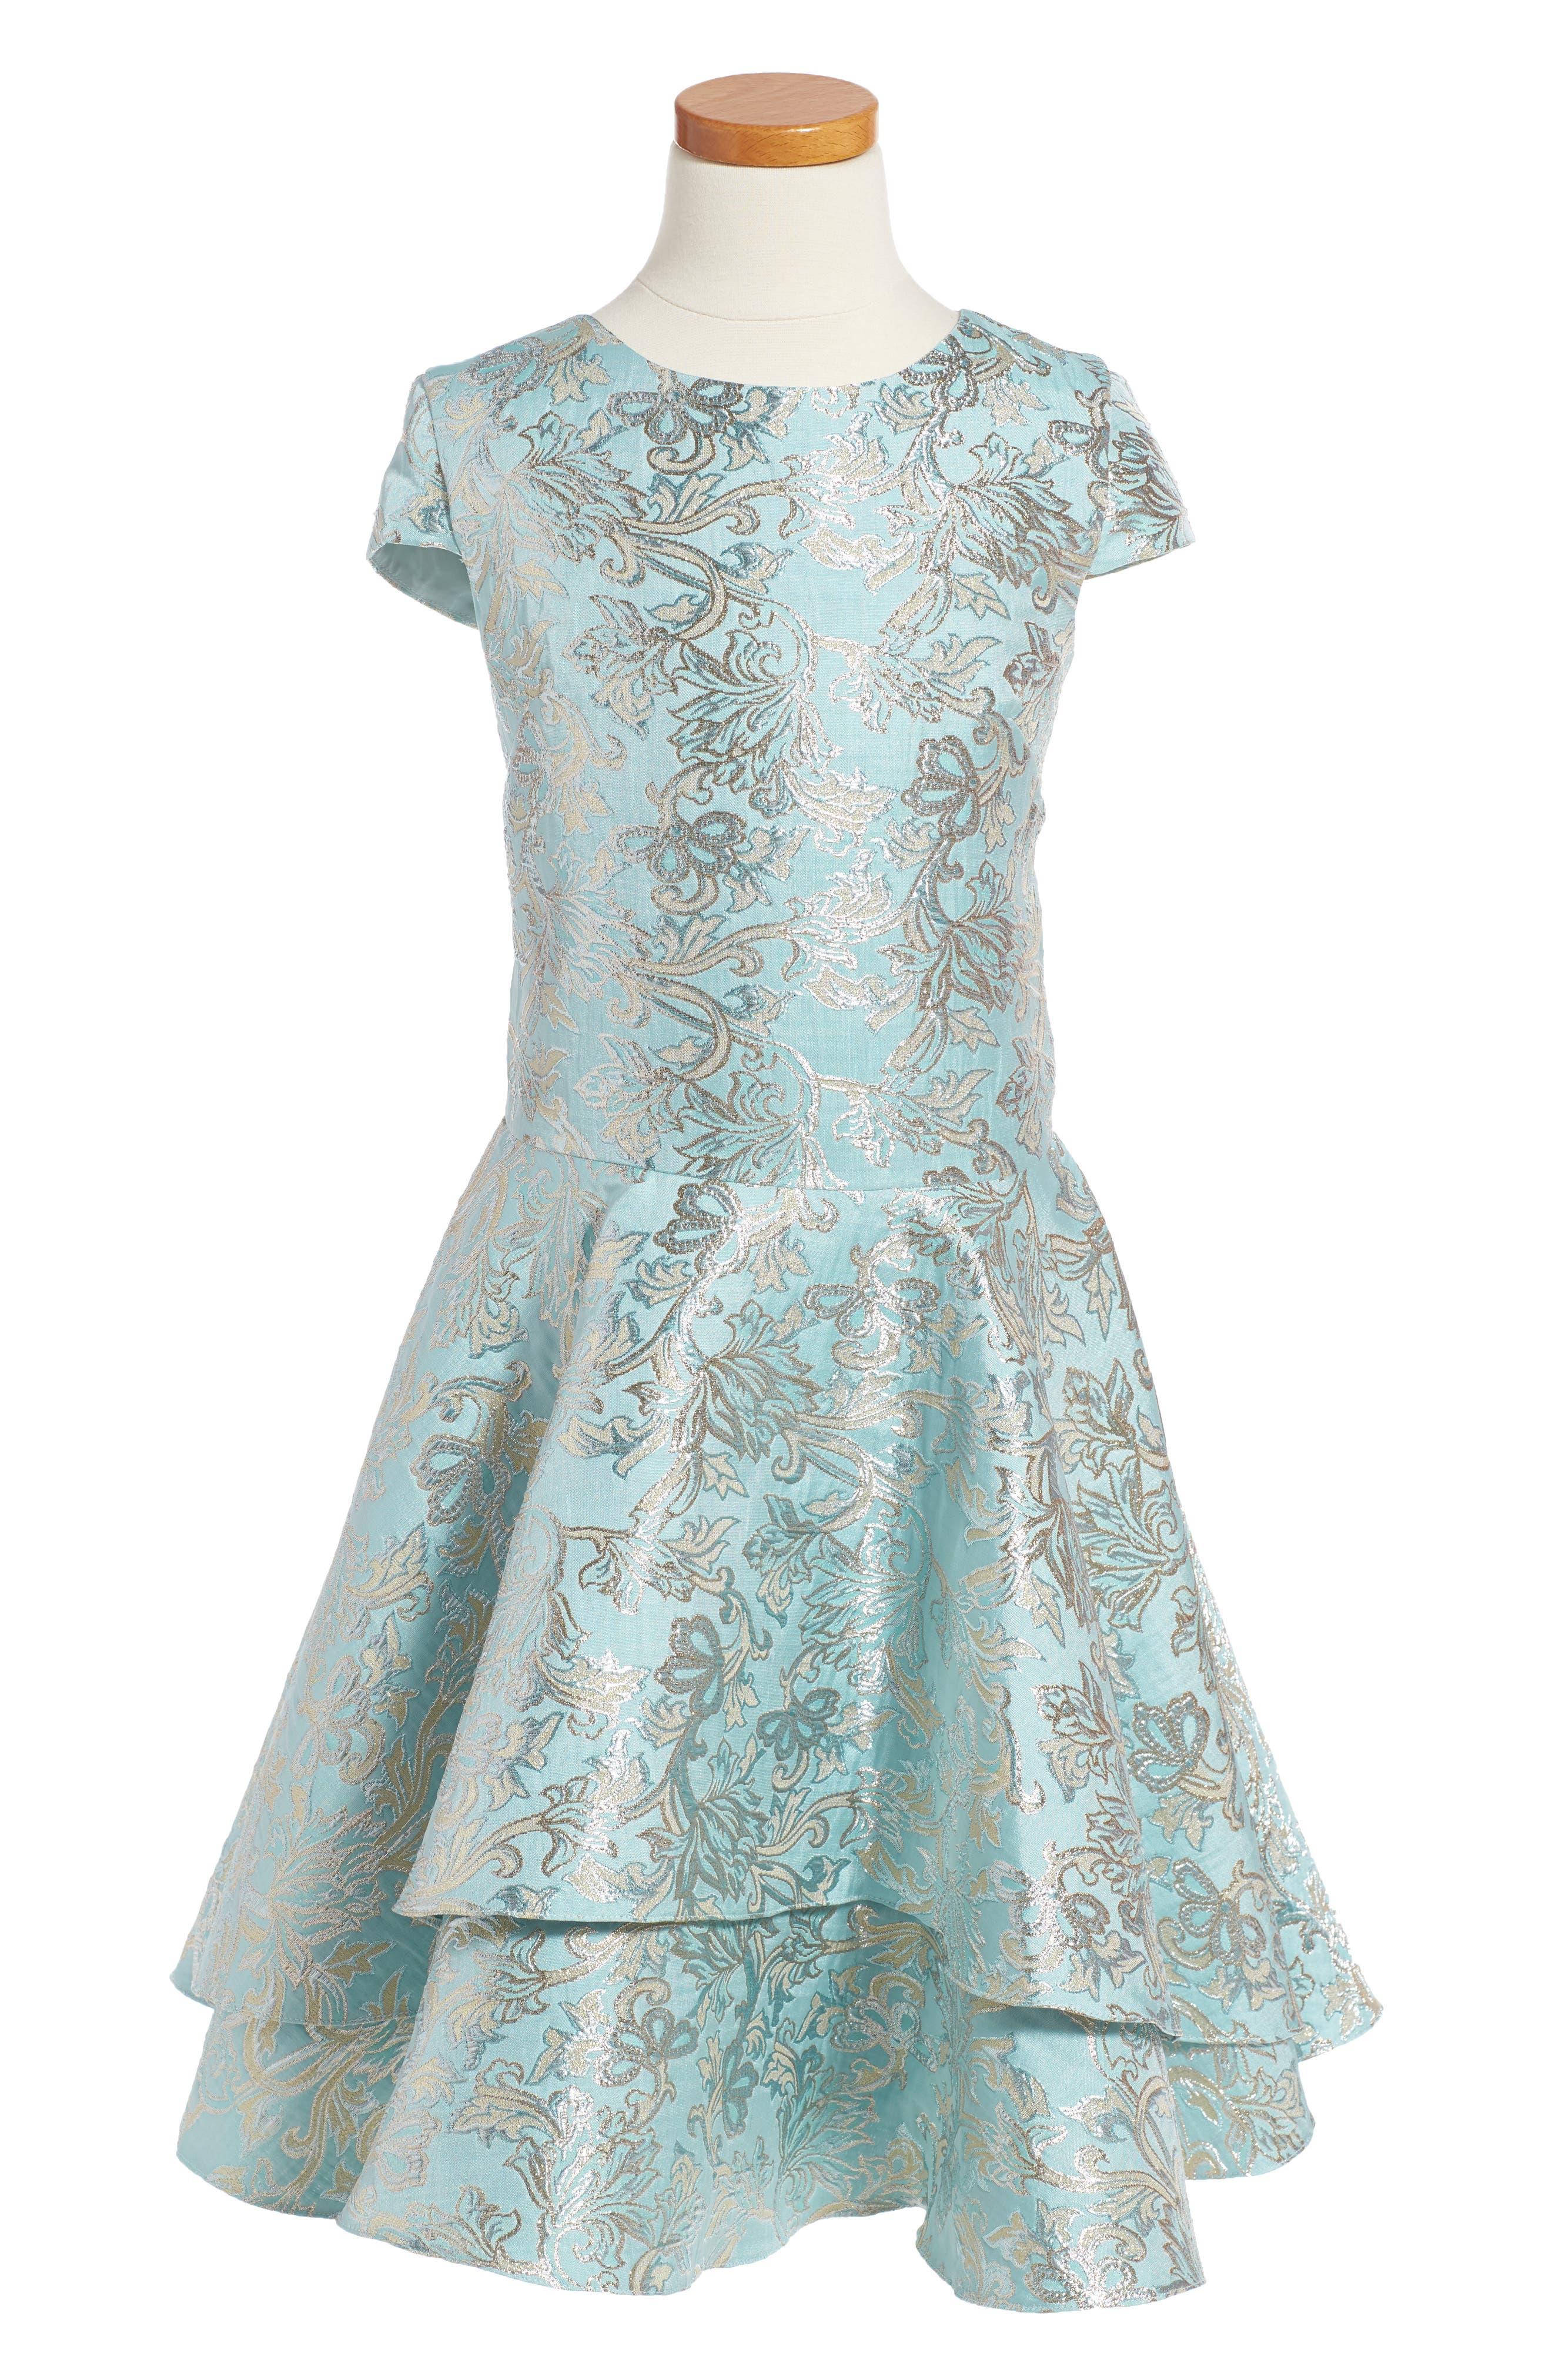 DAVID CHARLES Floral Brocade Dress